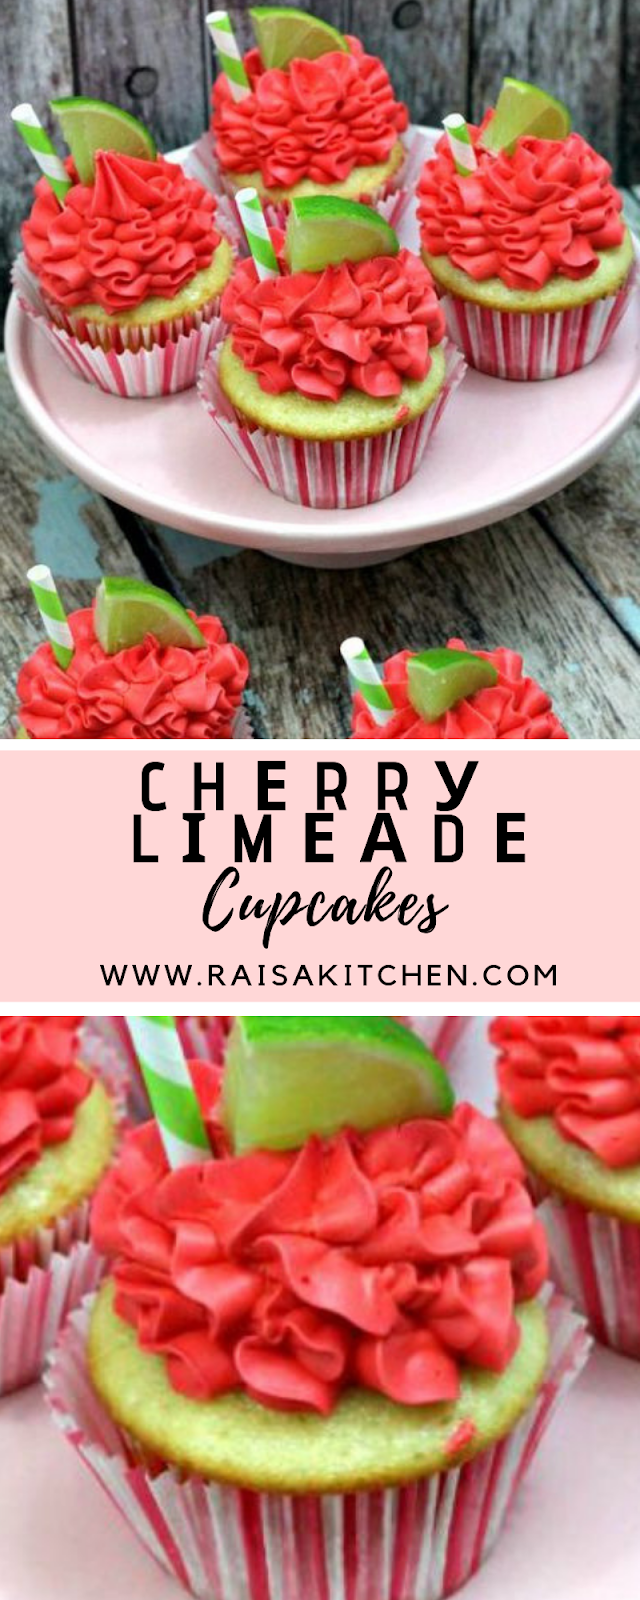 Chеrrу Lіmеаdе Cupcakes